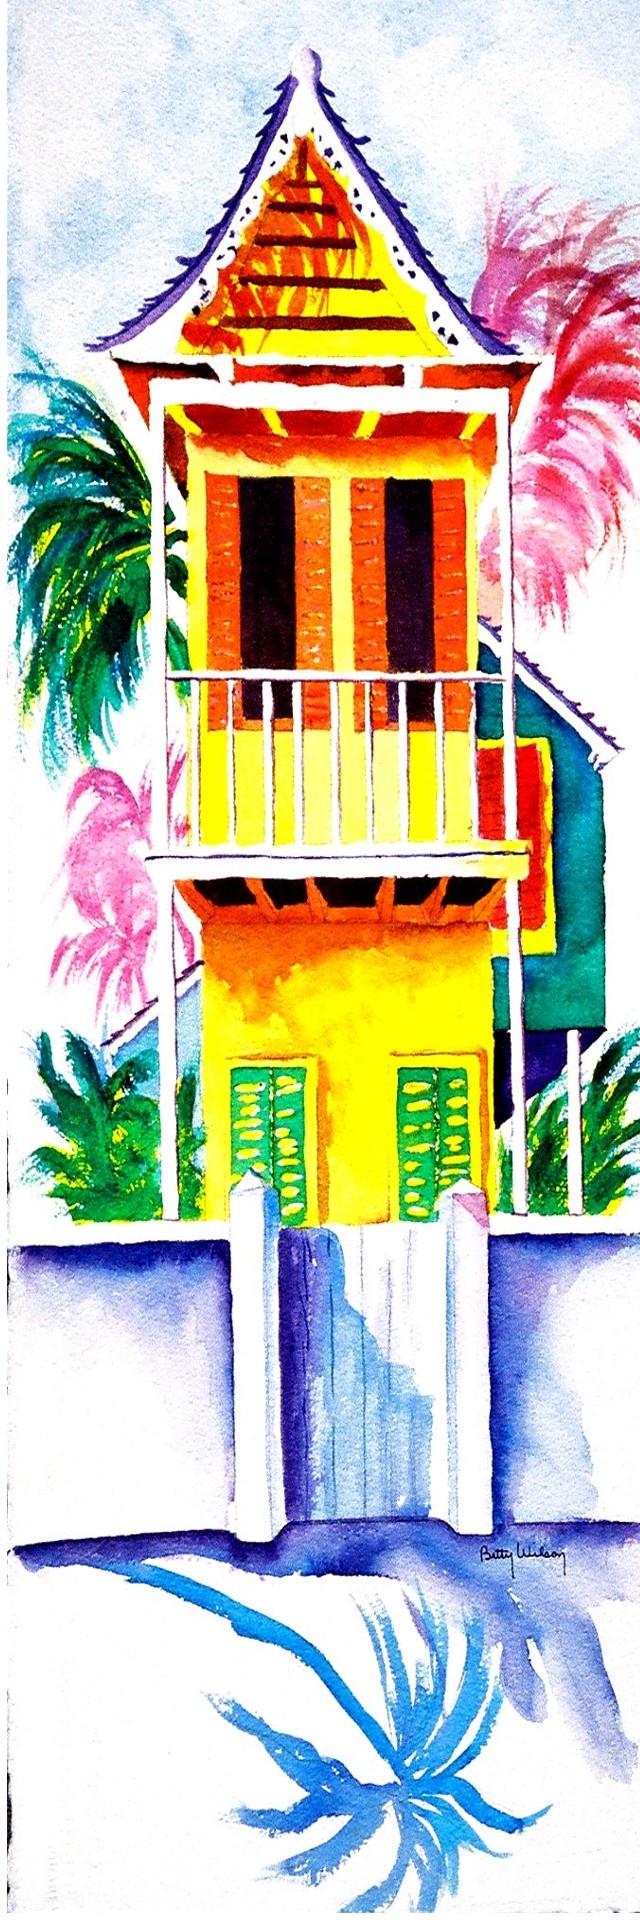 Watercolor artist magazine palm coast fl - Keywest Cottage By Terry Madden Terrymadden Com Small Artflorida